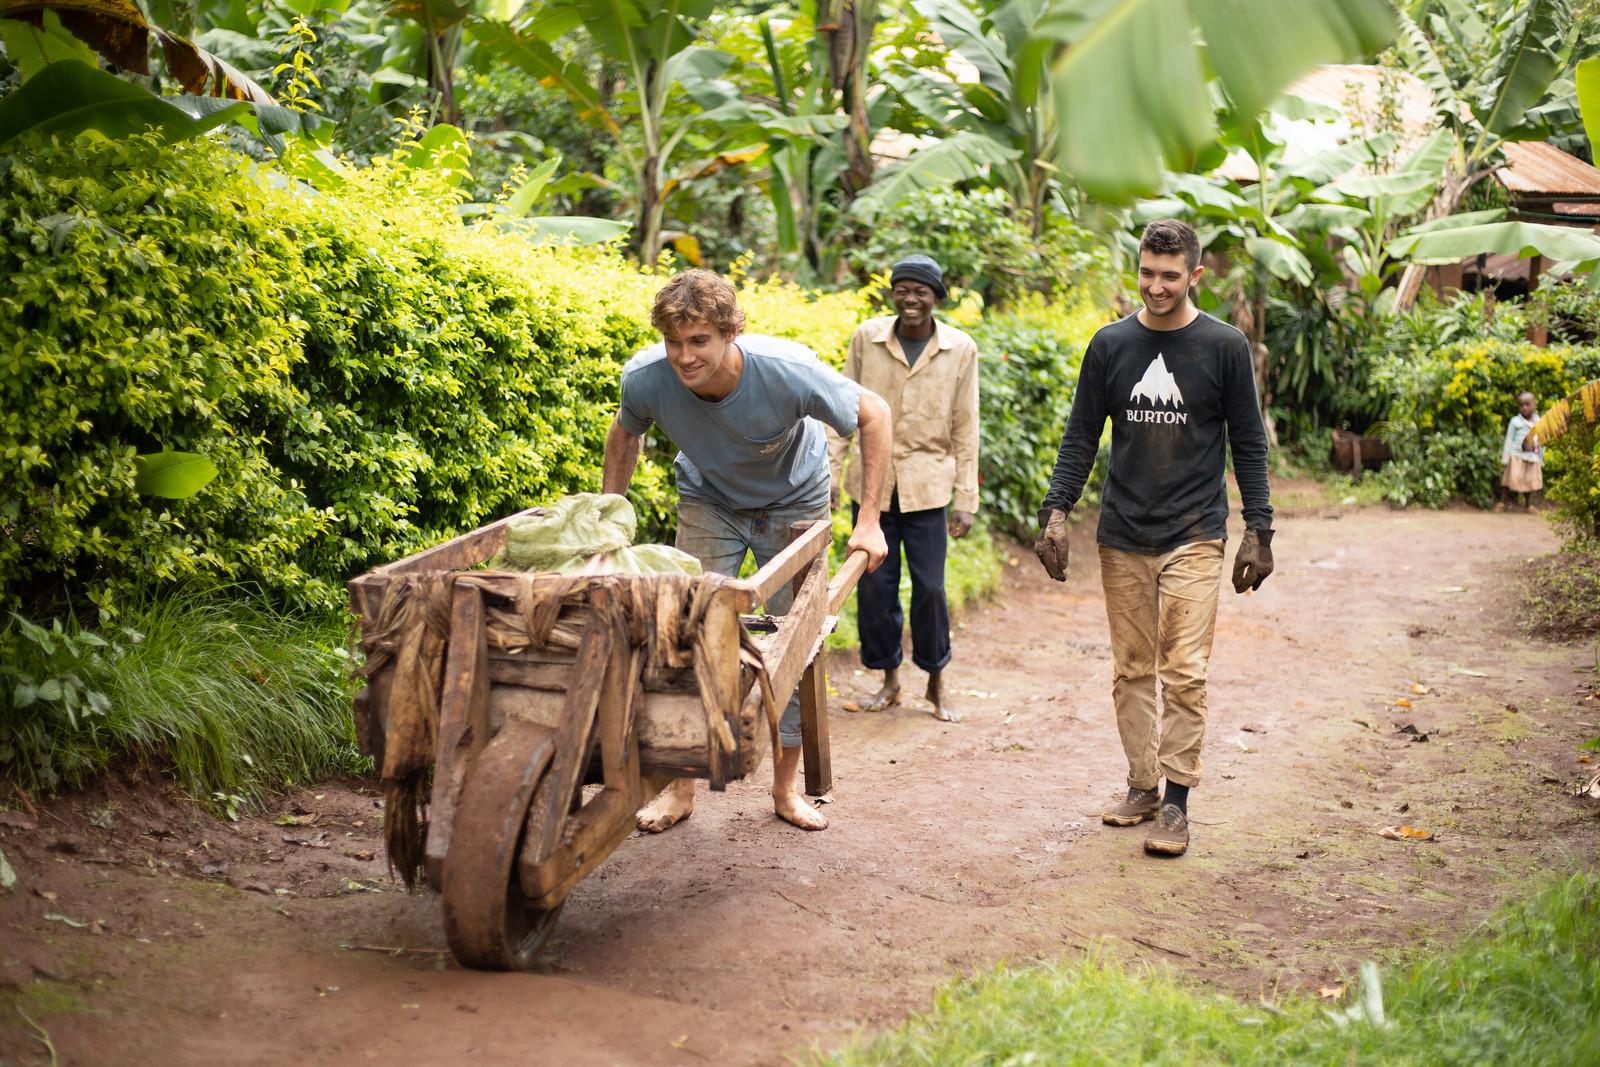 Student pushing a wheelbarrow up an incline in the village of Mkyashi, Tanzania.